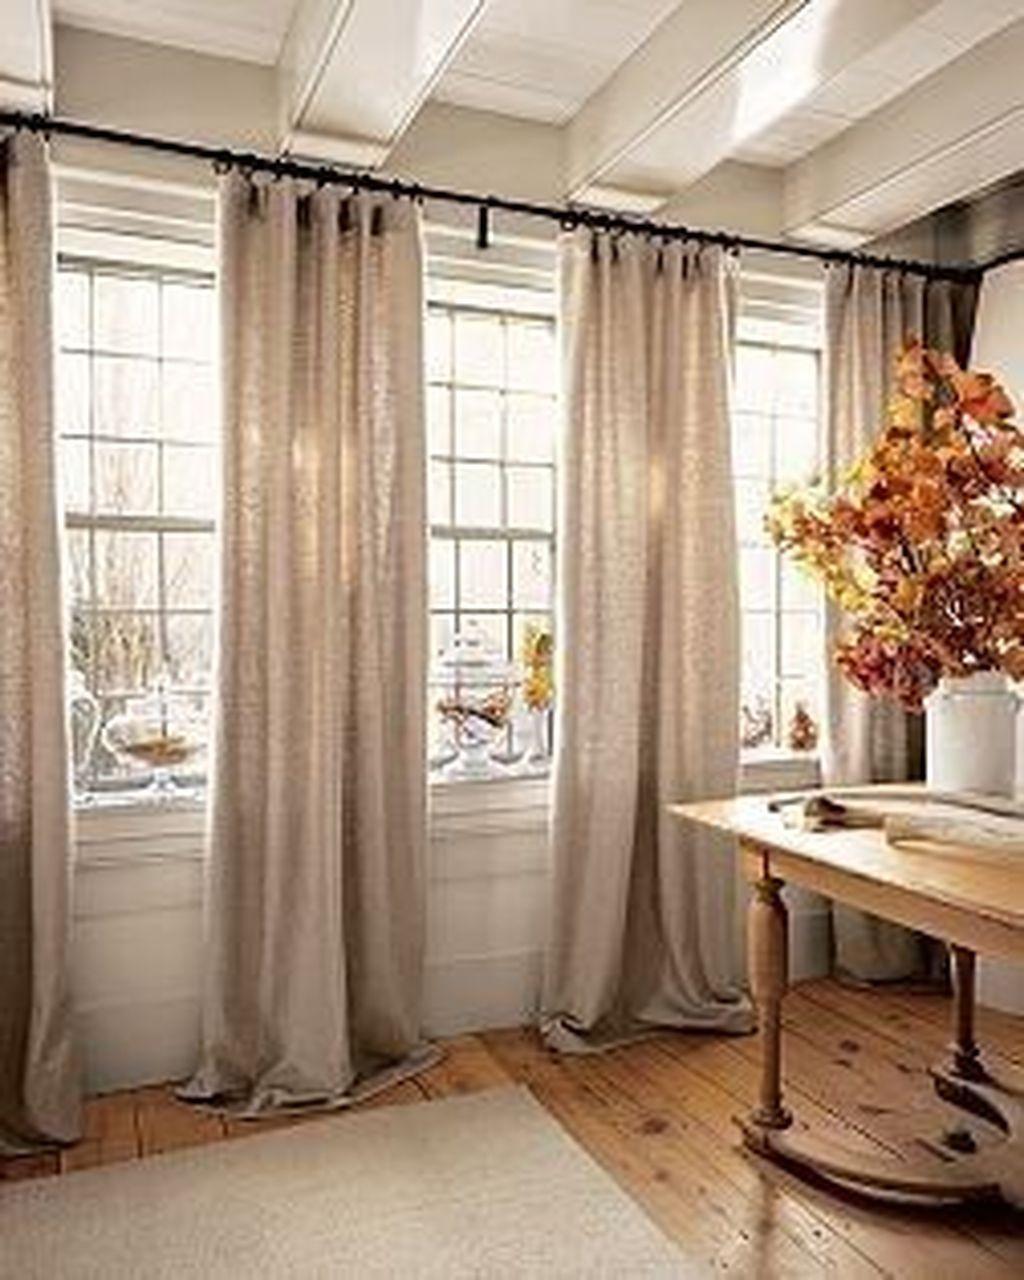 4 window curtain ideas  pin by tara gardiner on farm house  pinterest  living room room